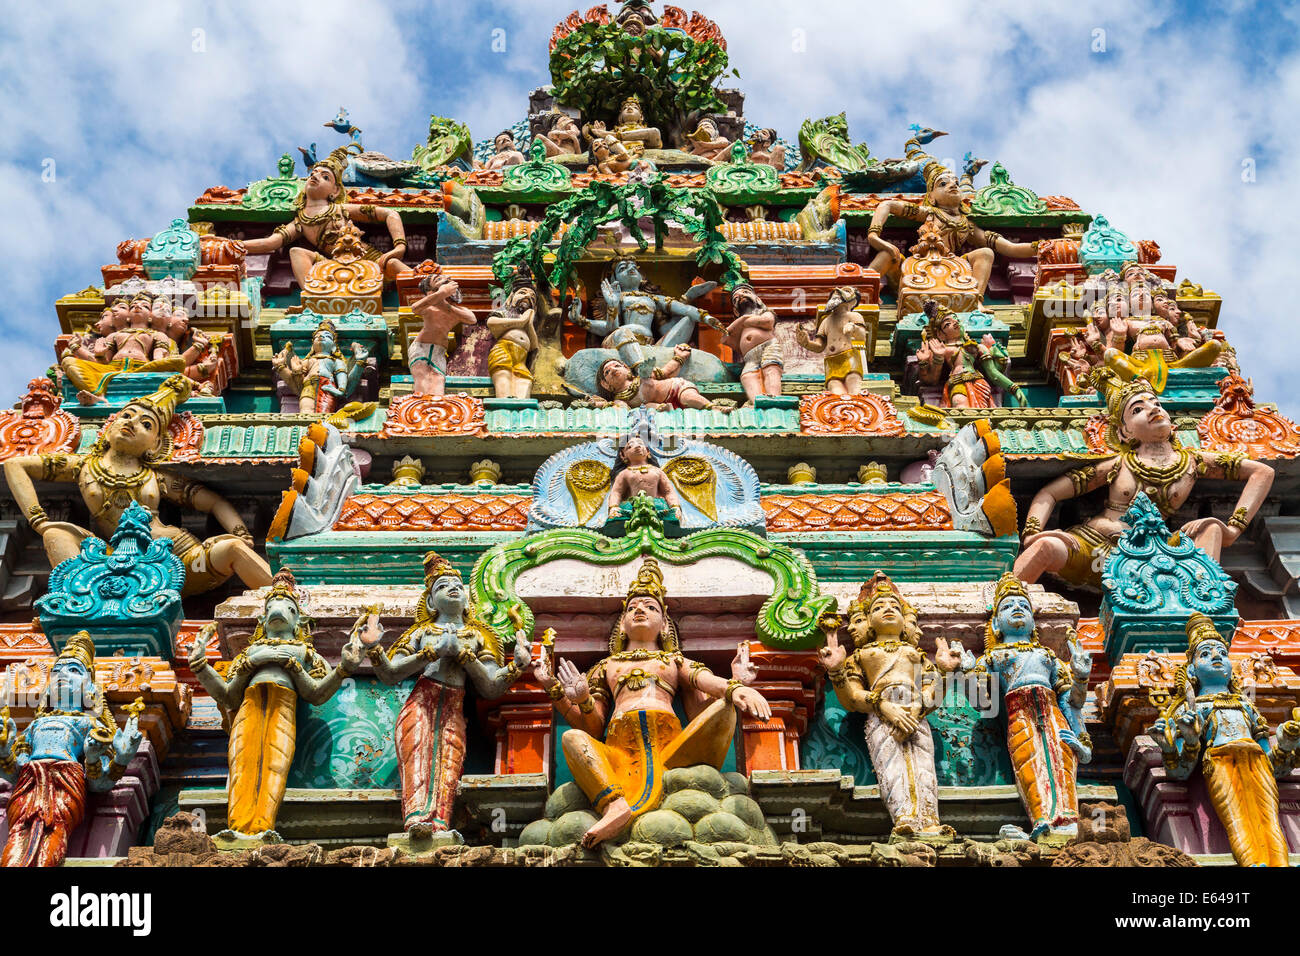 Kapaleeswarar Hindu Temple, Chennai, (Madras), Tamil Nadu, India - Stock Image